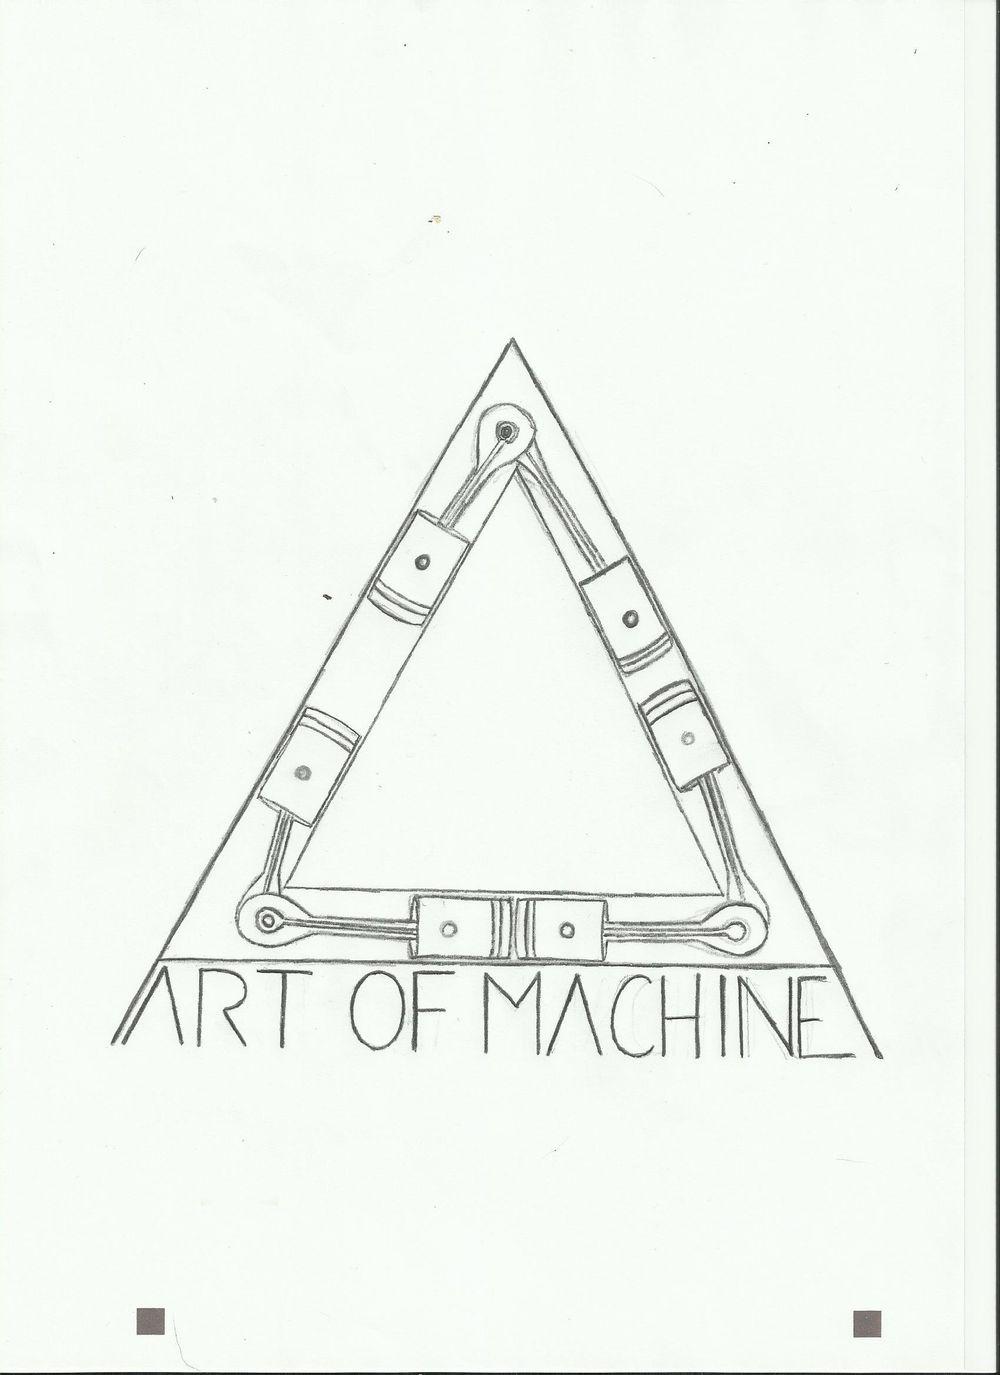 Art of Machine - image 5 - student project